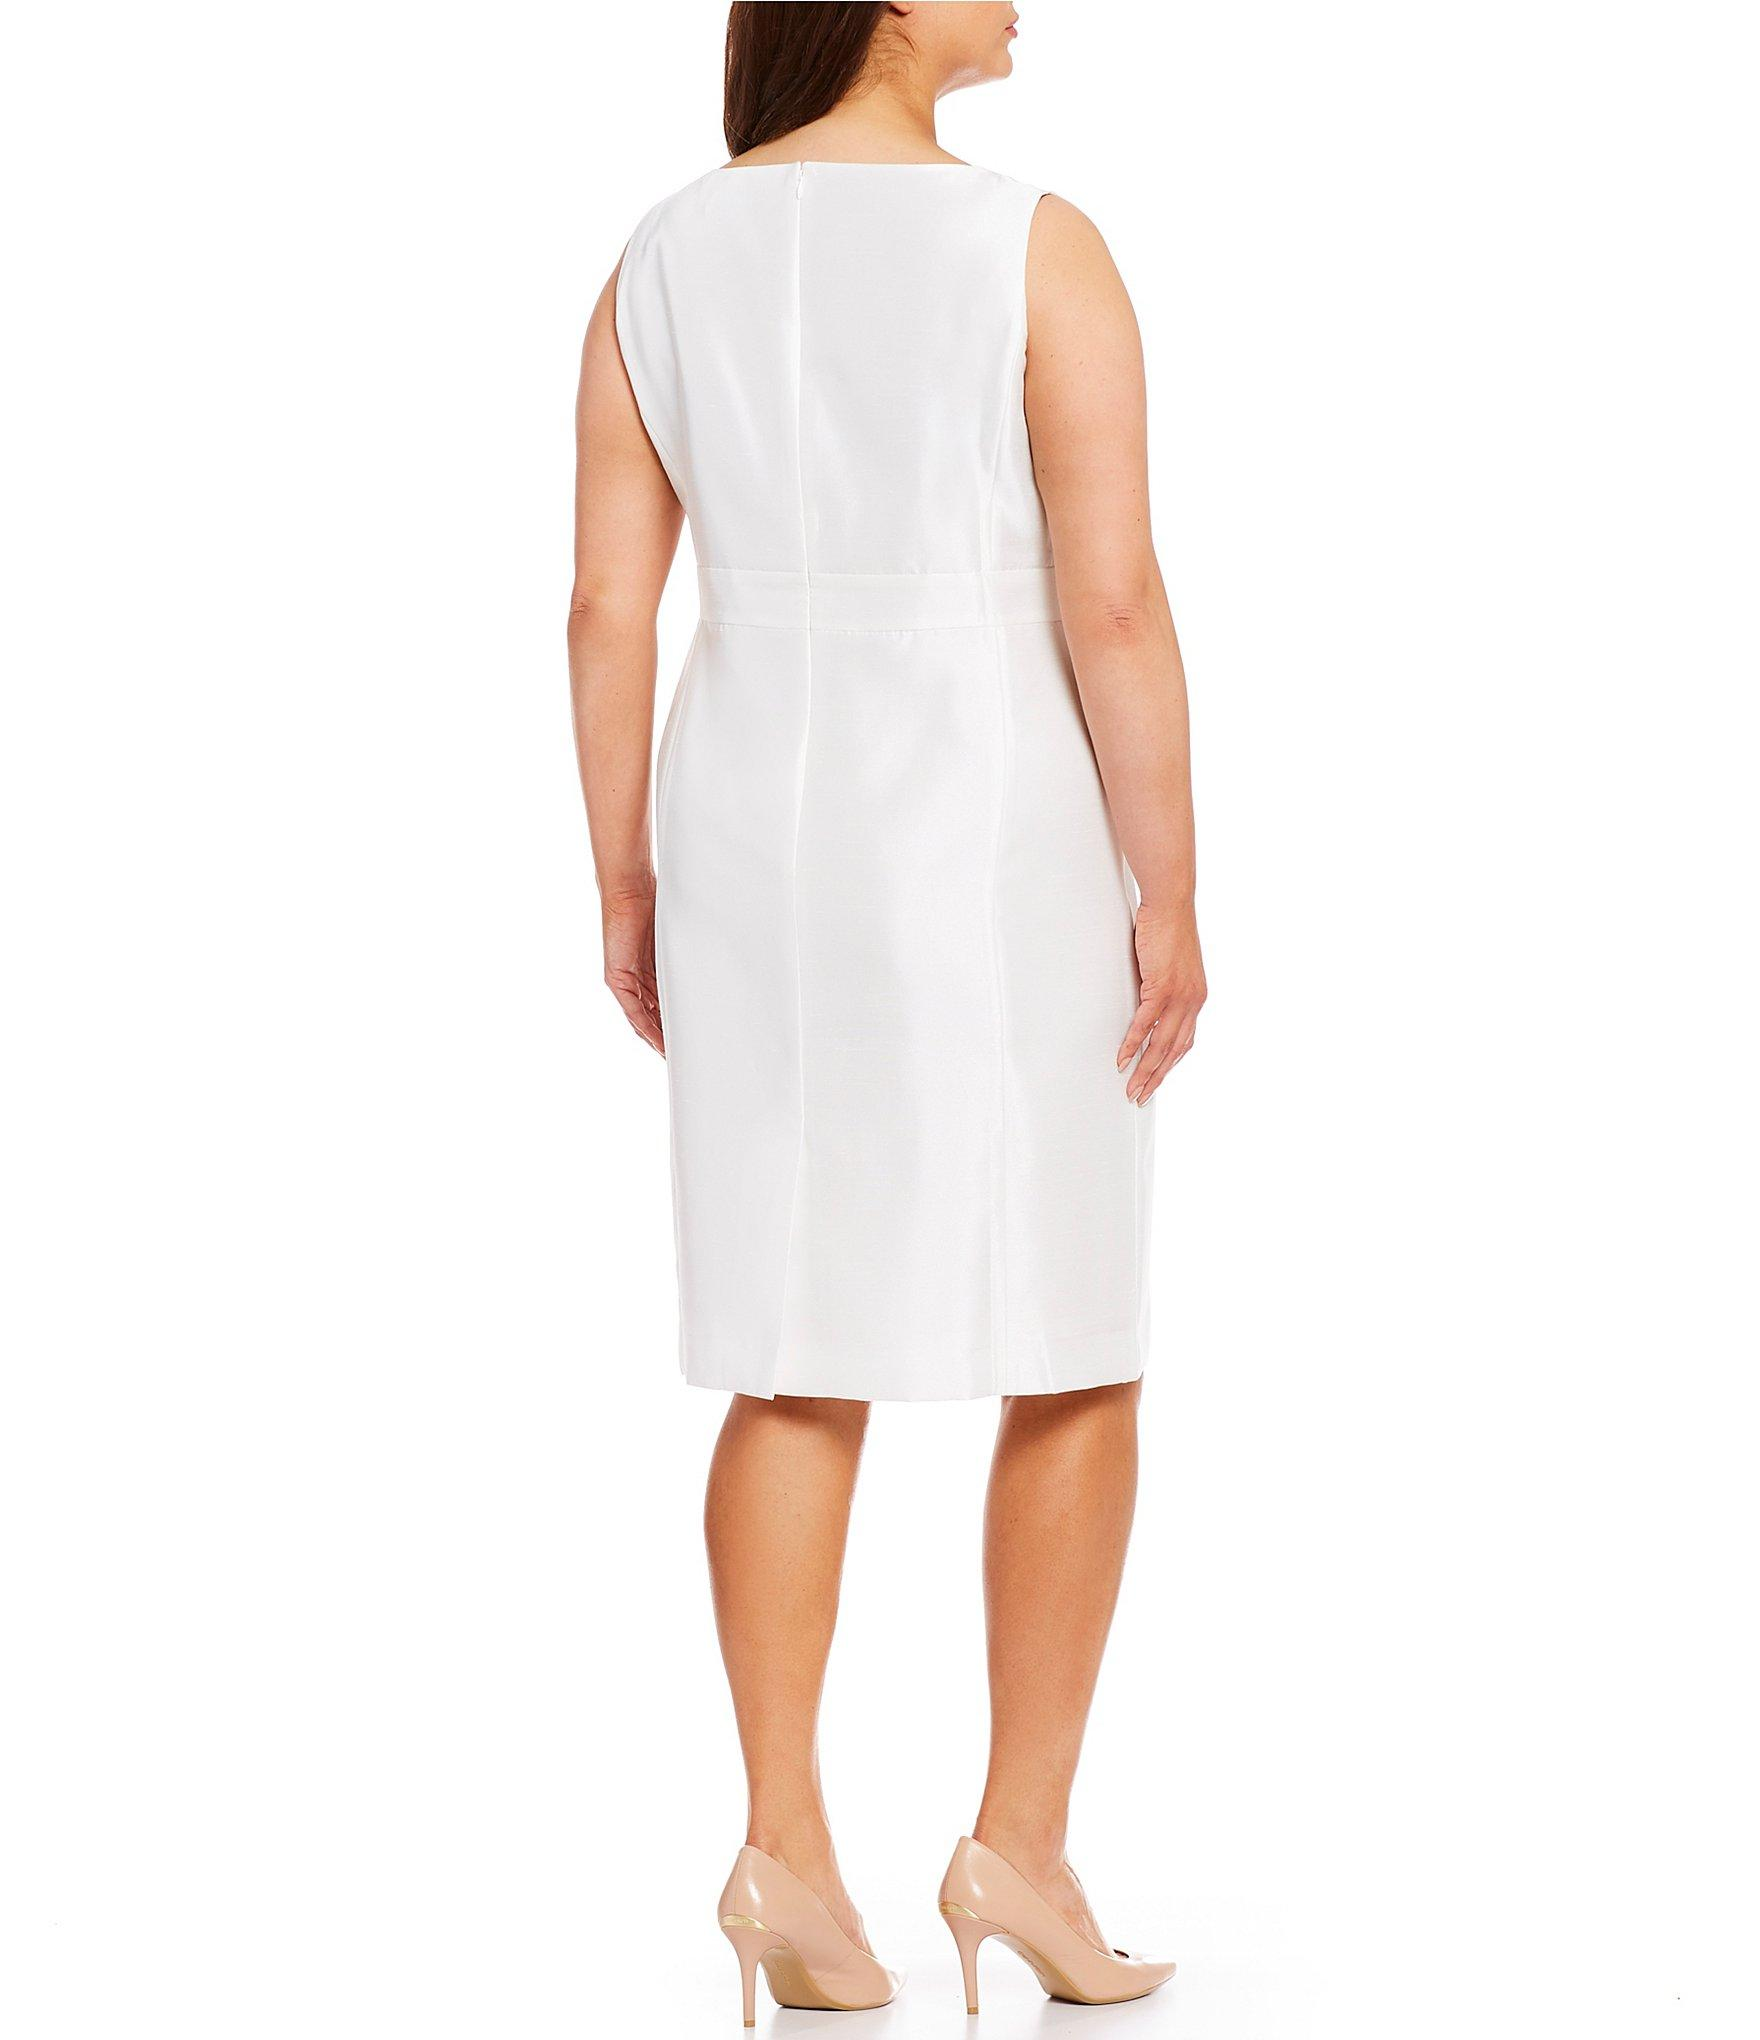 d2eafa1a Kasper - White Plus Size Shantung Embellished Waist Sheath Dress - Lyst.  View fullscreen